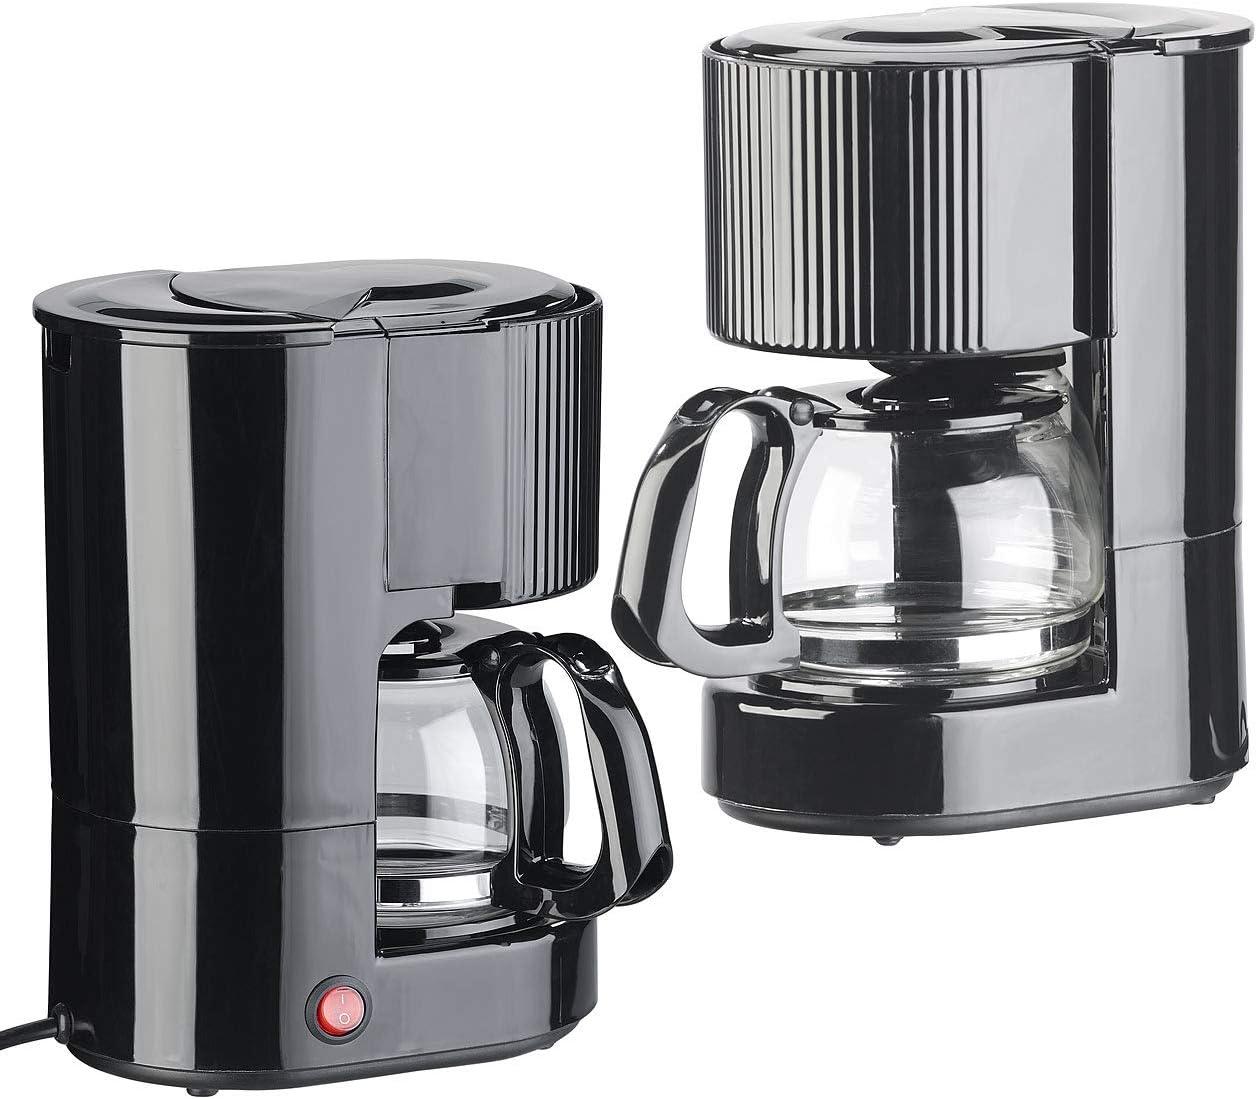 Rosenstein & Söhne 12v Kaffeemaschine